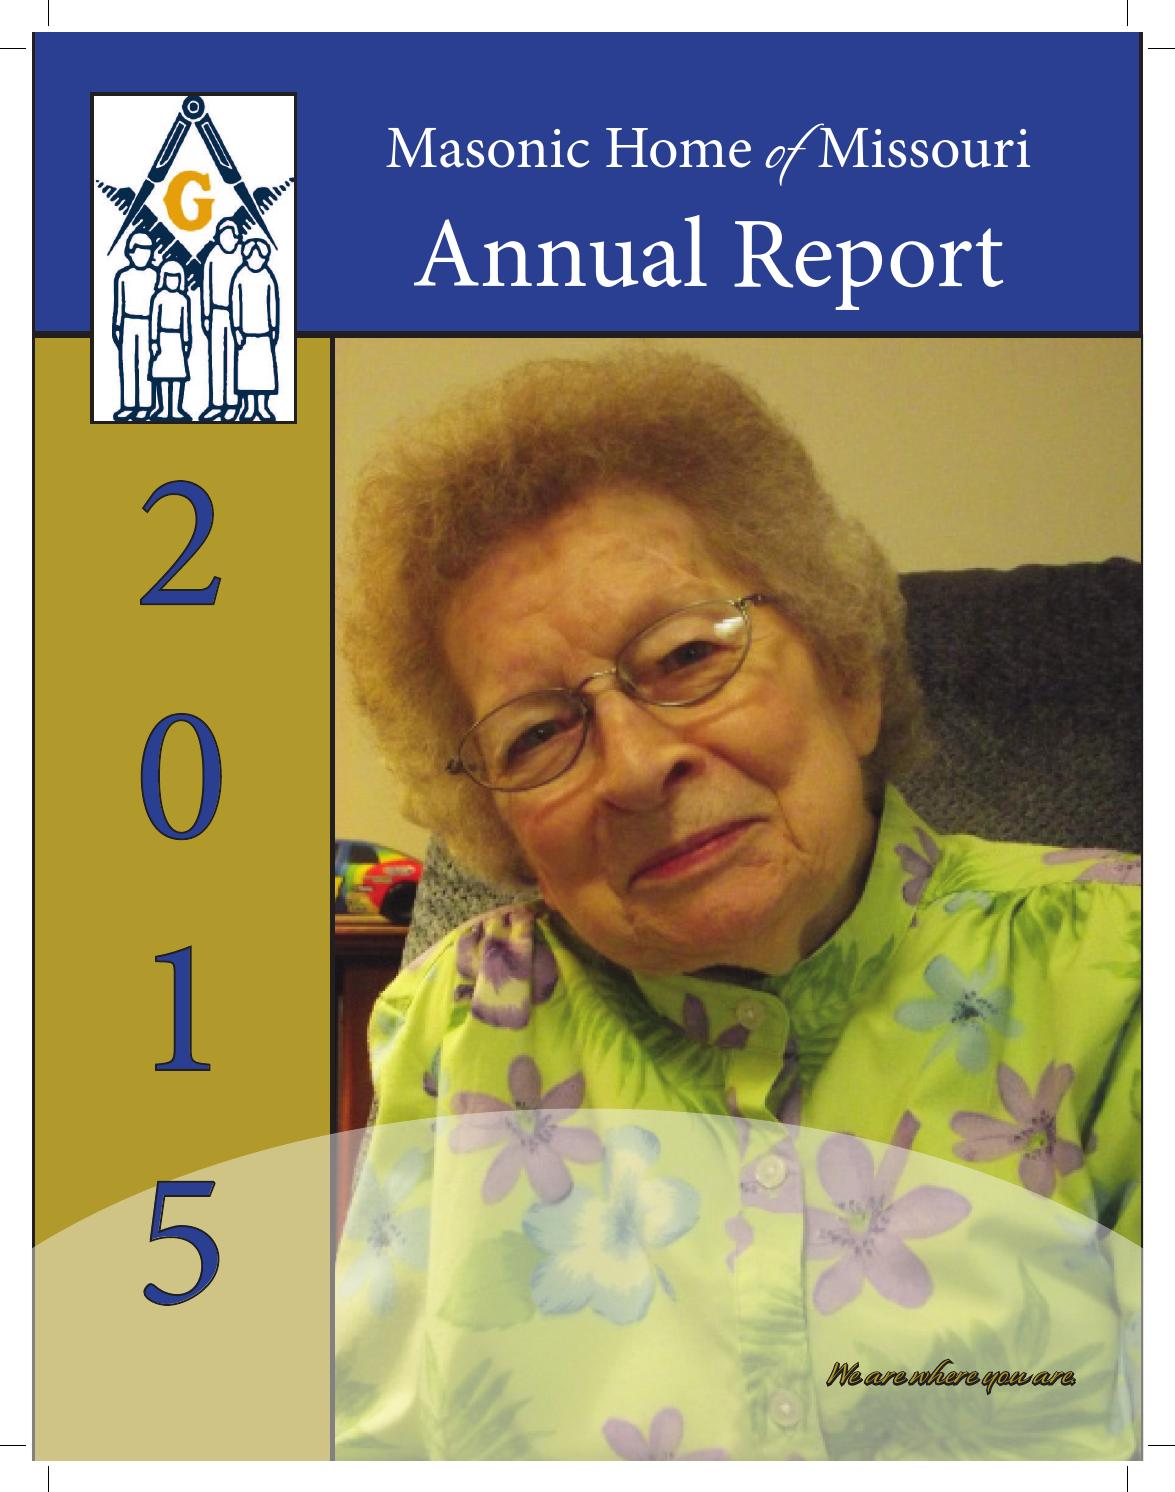 Masonic Home of Missouri Annual Report 2015 by Masonic ...